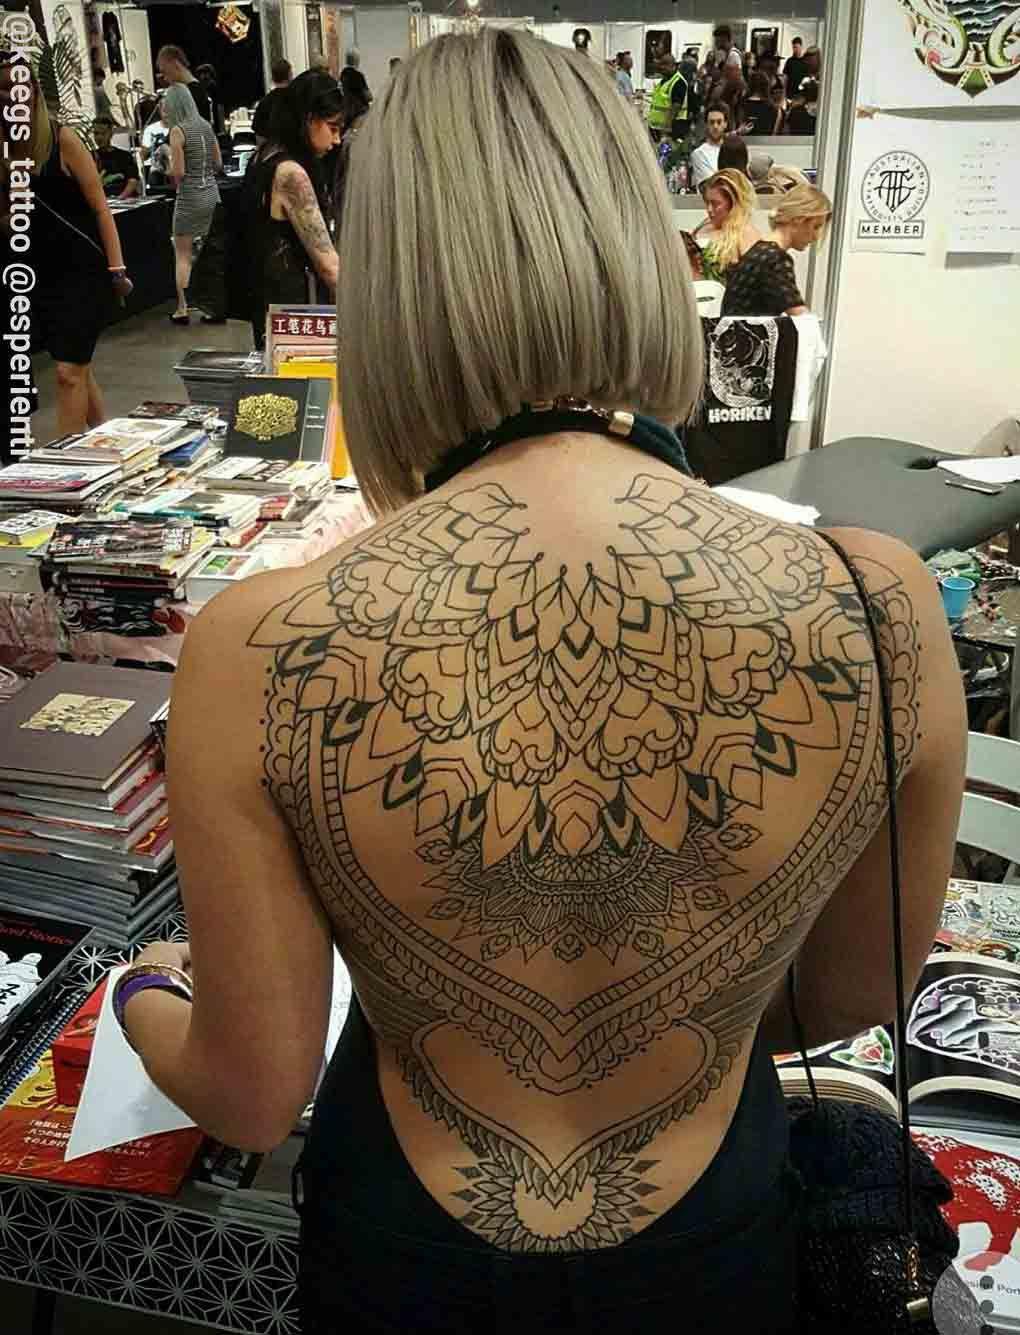 Female Back Tattoo Tattoos Back Tattoo Women Tattoos Full Back within sizing 1020 X 1335